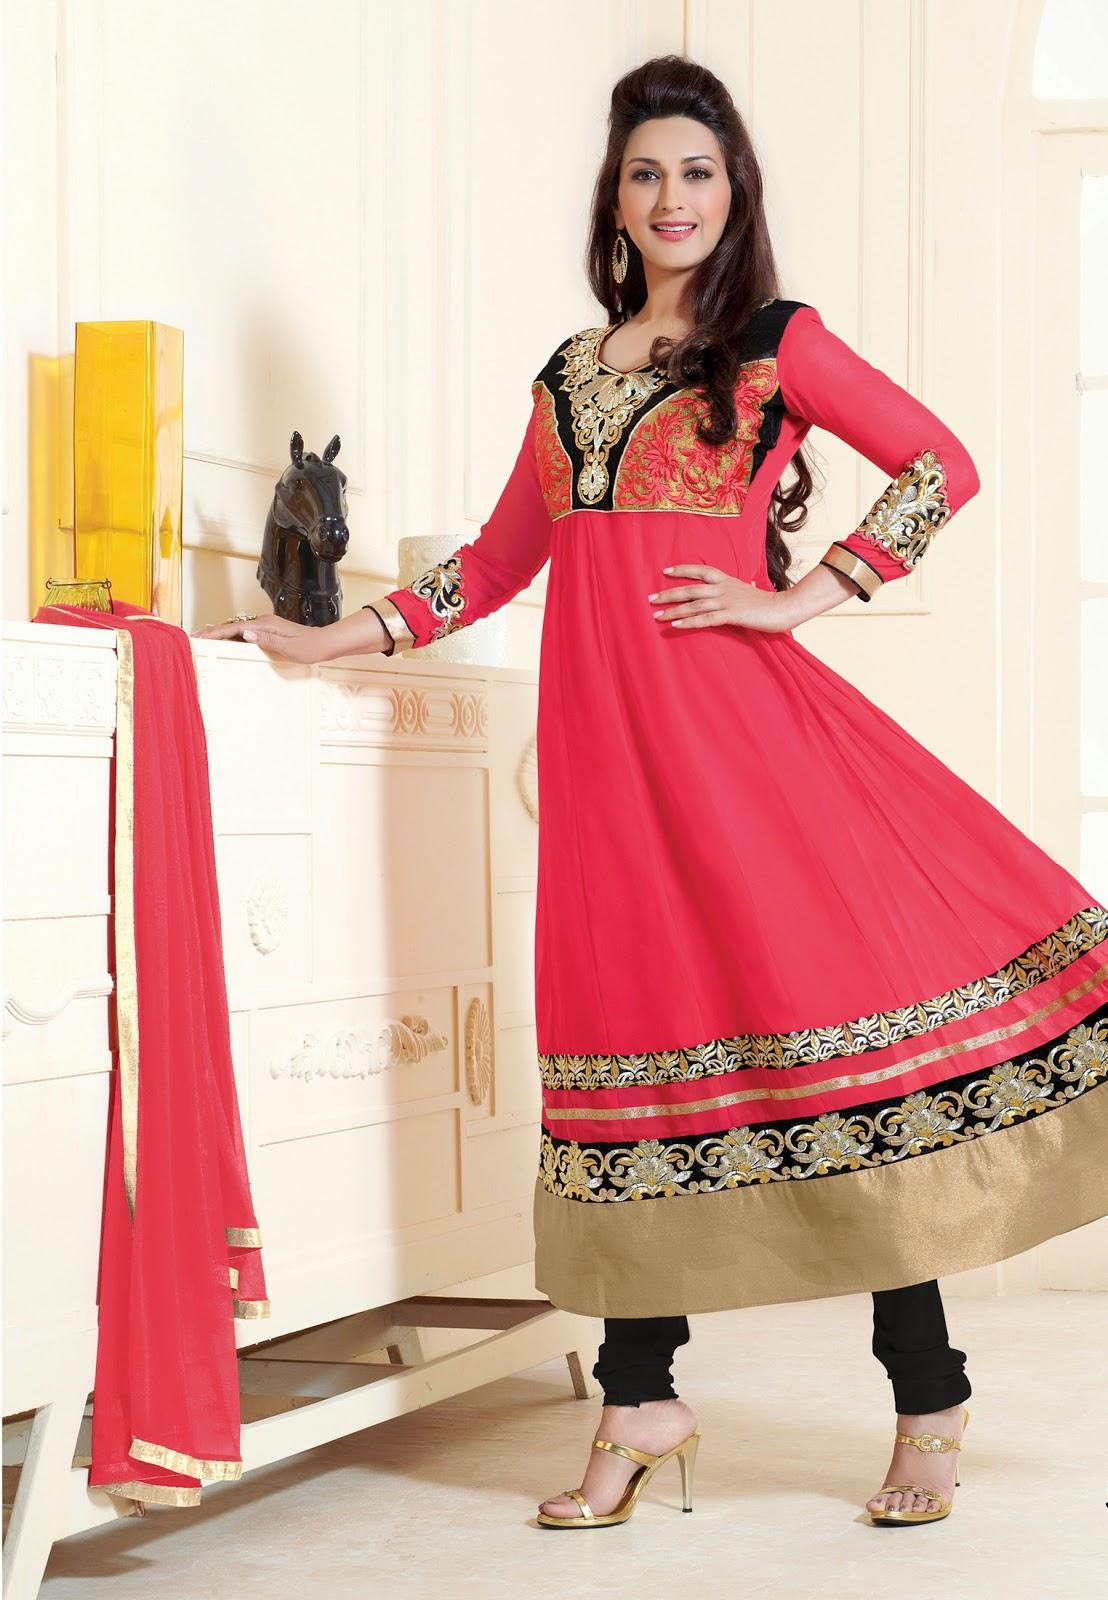 b6010d71a5 Sonali Bendre Designer Anarkali Suits for Parties @ Amazon Fabdeal UK